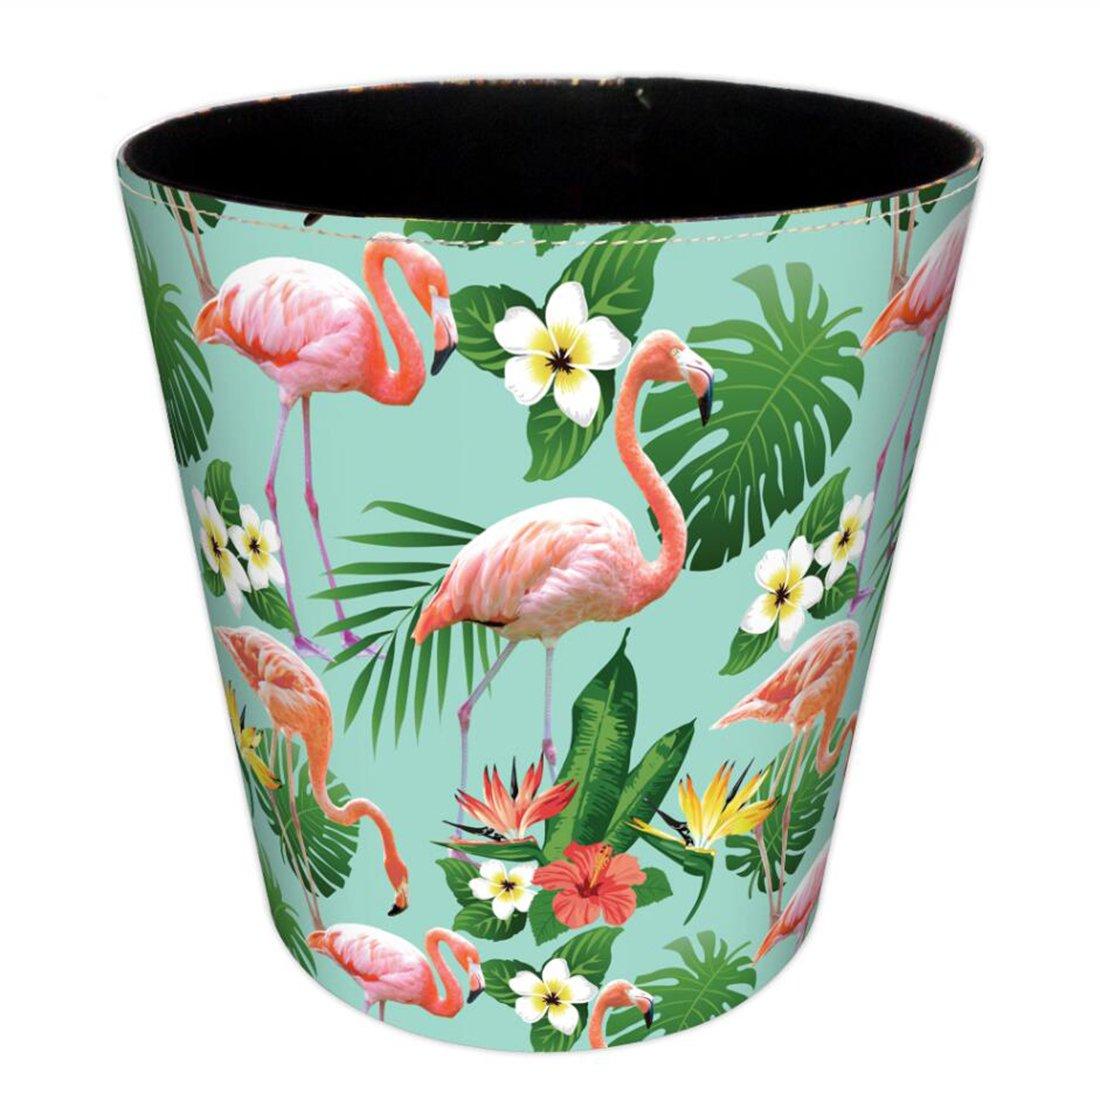 Bedroom Bin, Foxom PU Leather Wastebasket Waste Paper Bin for Bedroom, Living Room, Kitchen, Office - Flamingo Pattern